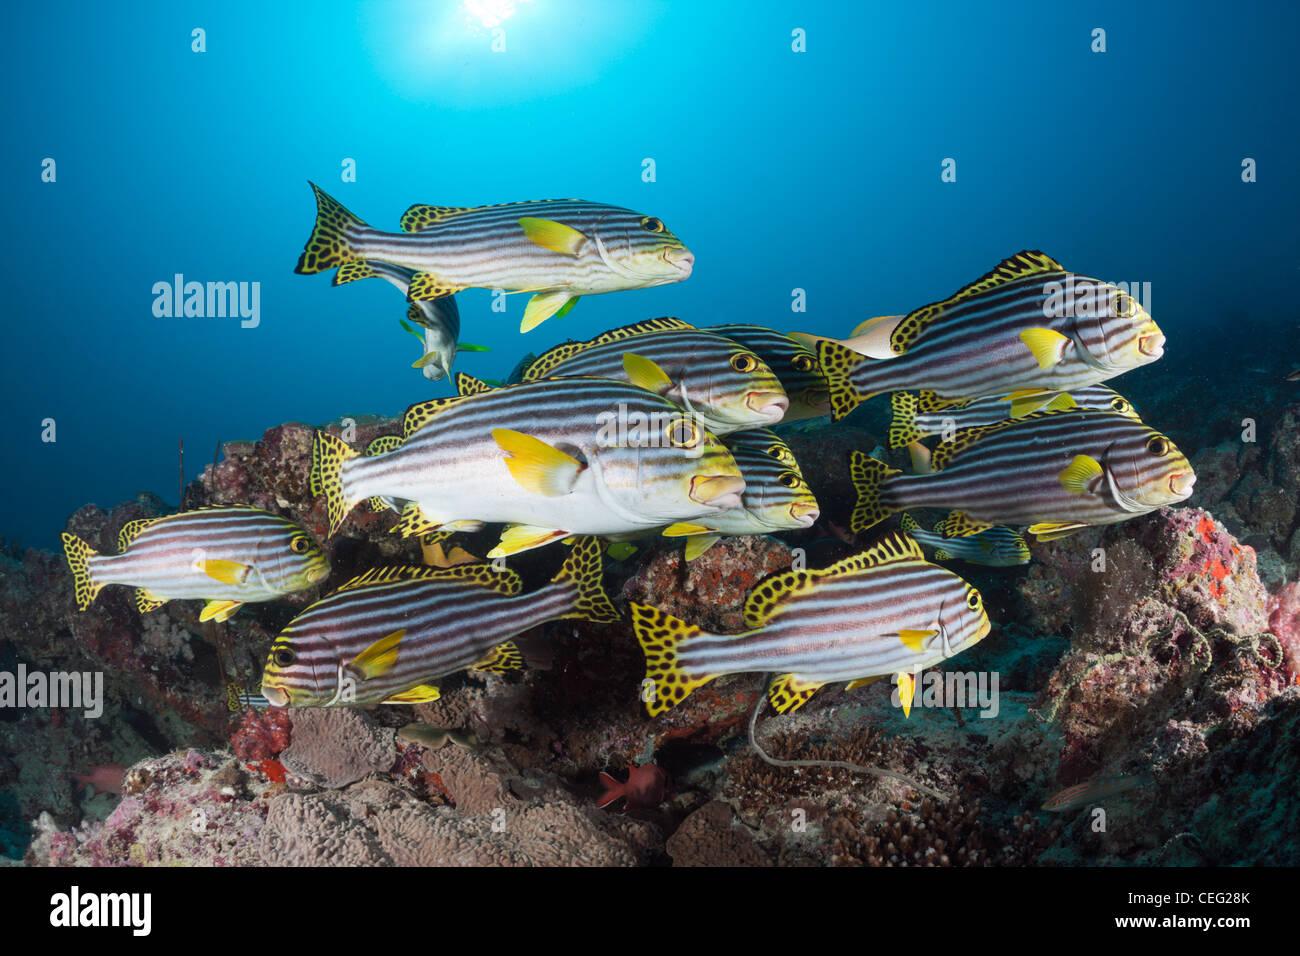 Cardumen de orientales, Sweetlips Plectorhinchus vittatus, North Male Atoll, Maldivas, Océano Índico Imagen De Stock